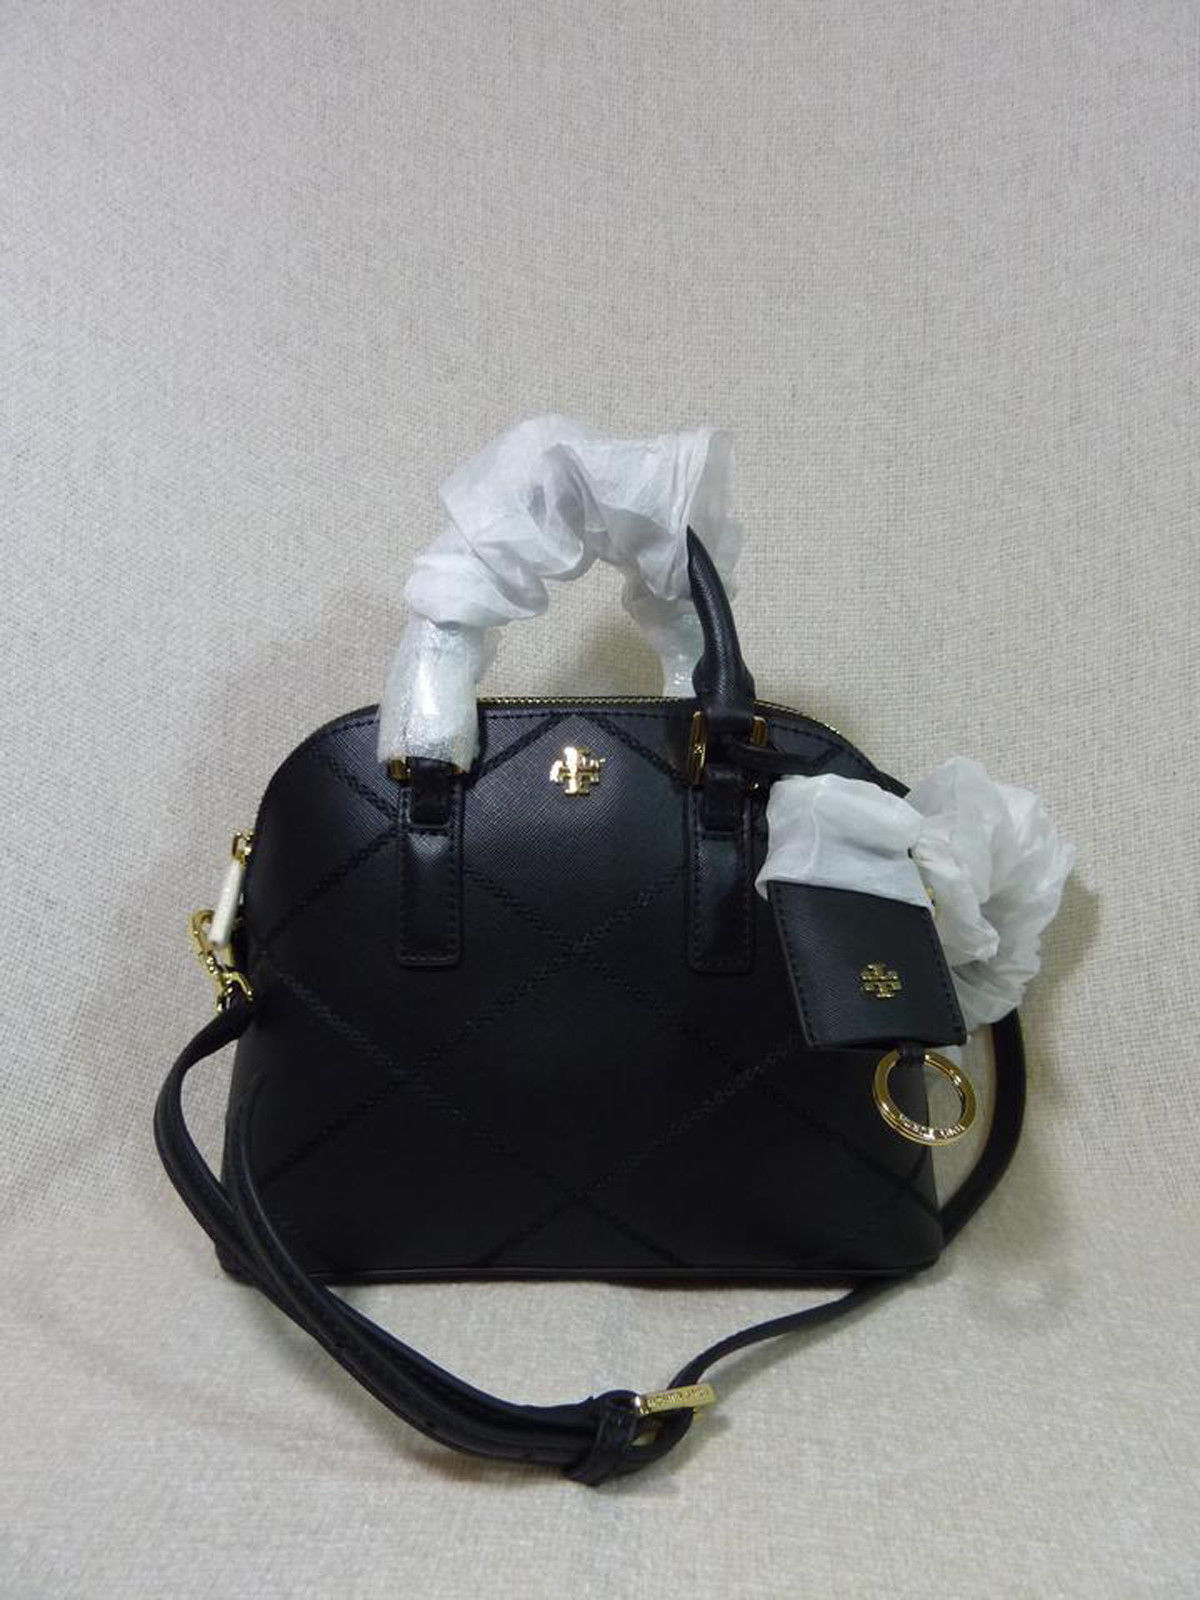 NWT Tory Burch Black Saffiano Mini Robinson Stitched Dome Cross Body Bag  - $425